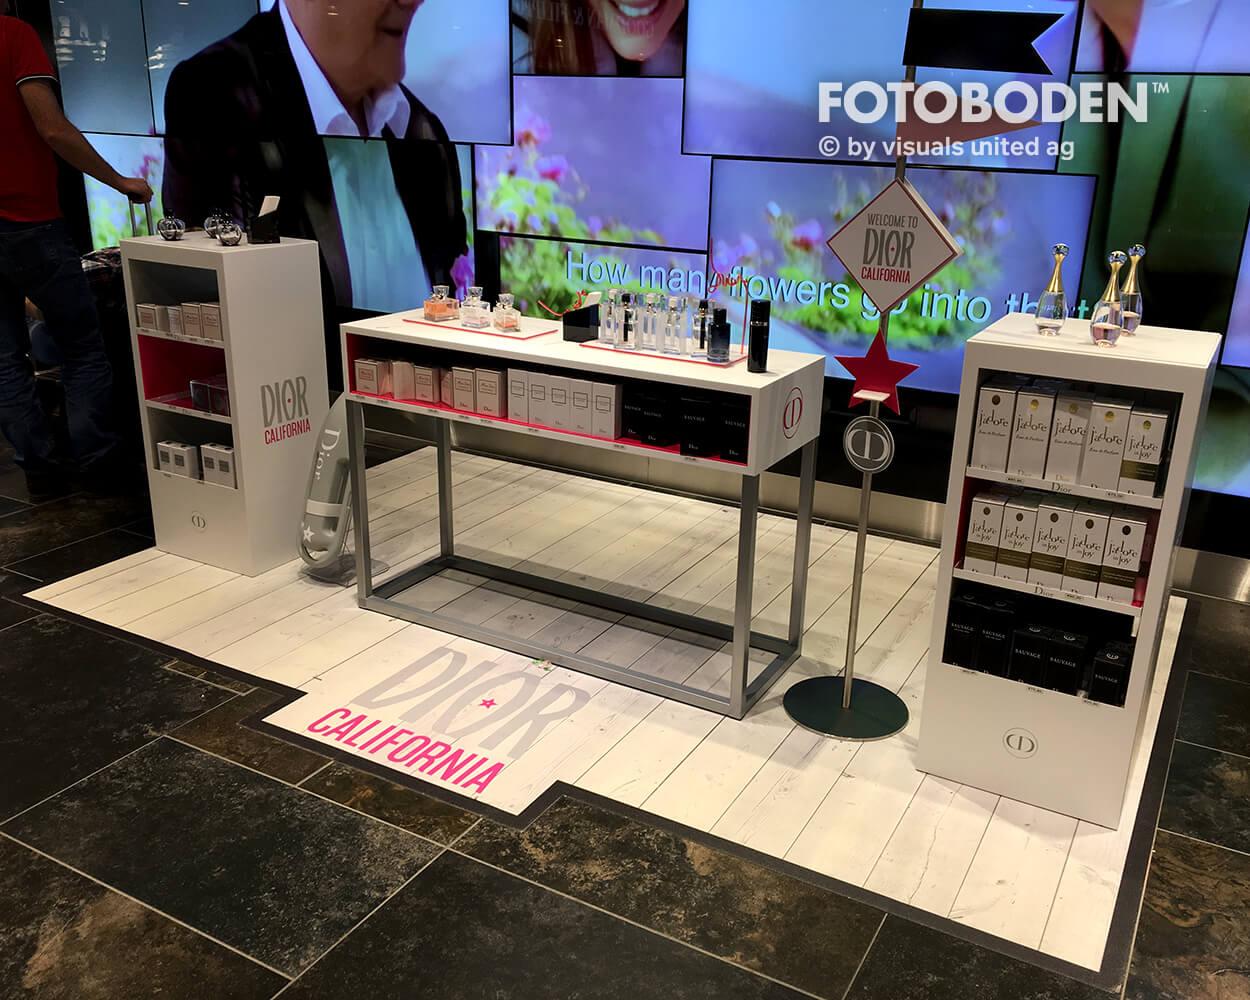 Dior Fotoboden Flooring Fußboden Bodengestaltung Floorminder Bodendruck Werbung Fußbodenwerbung Bodenwerbung Merchandising Advertising Visualmerchandising2